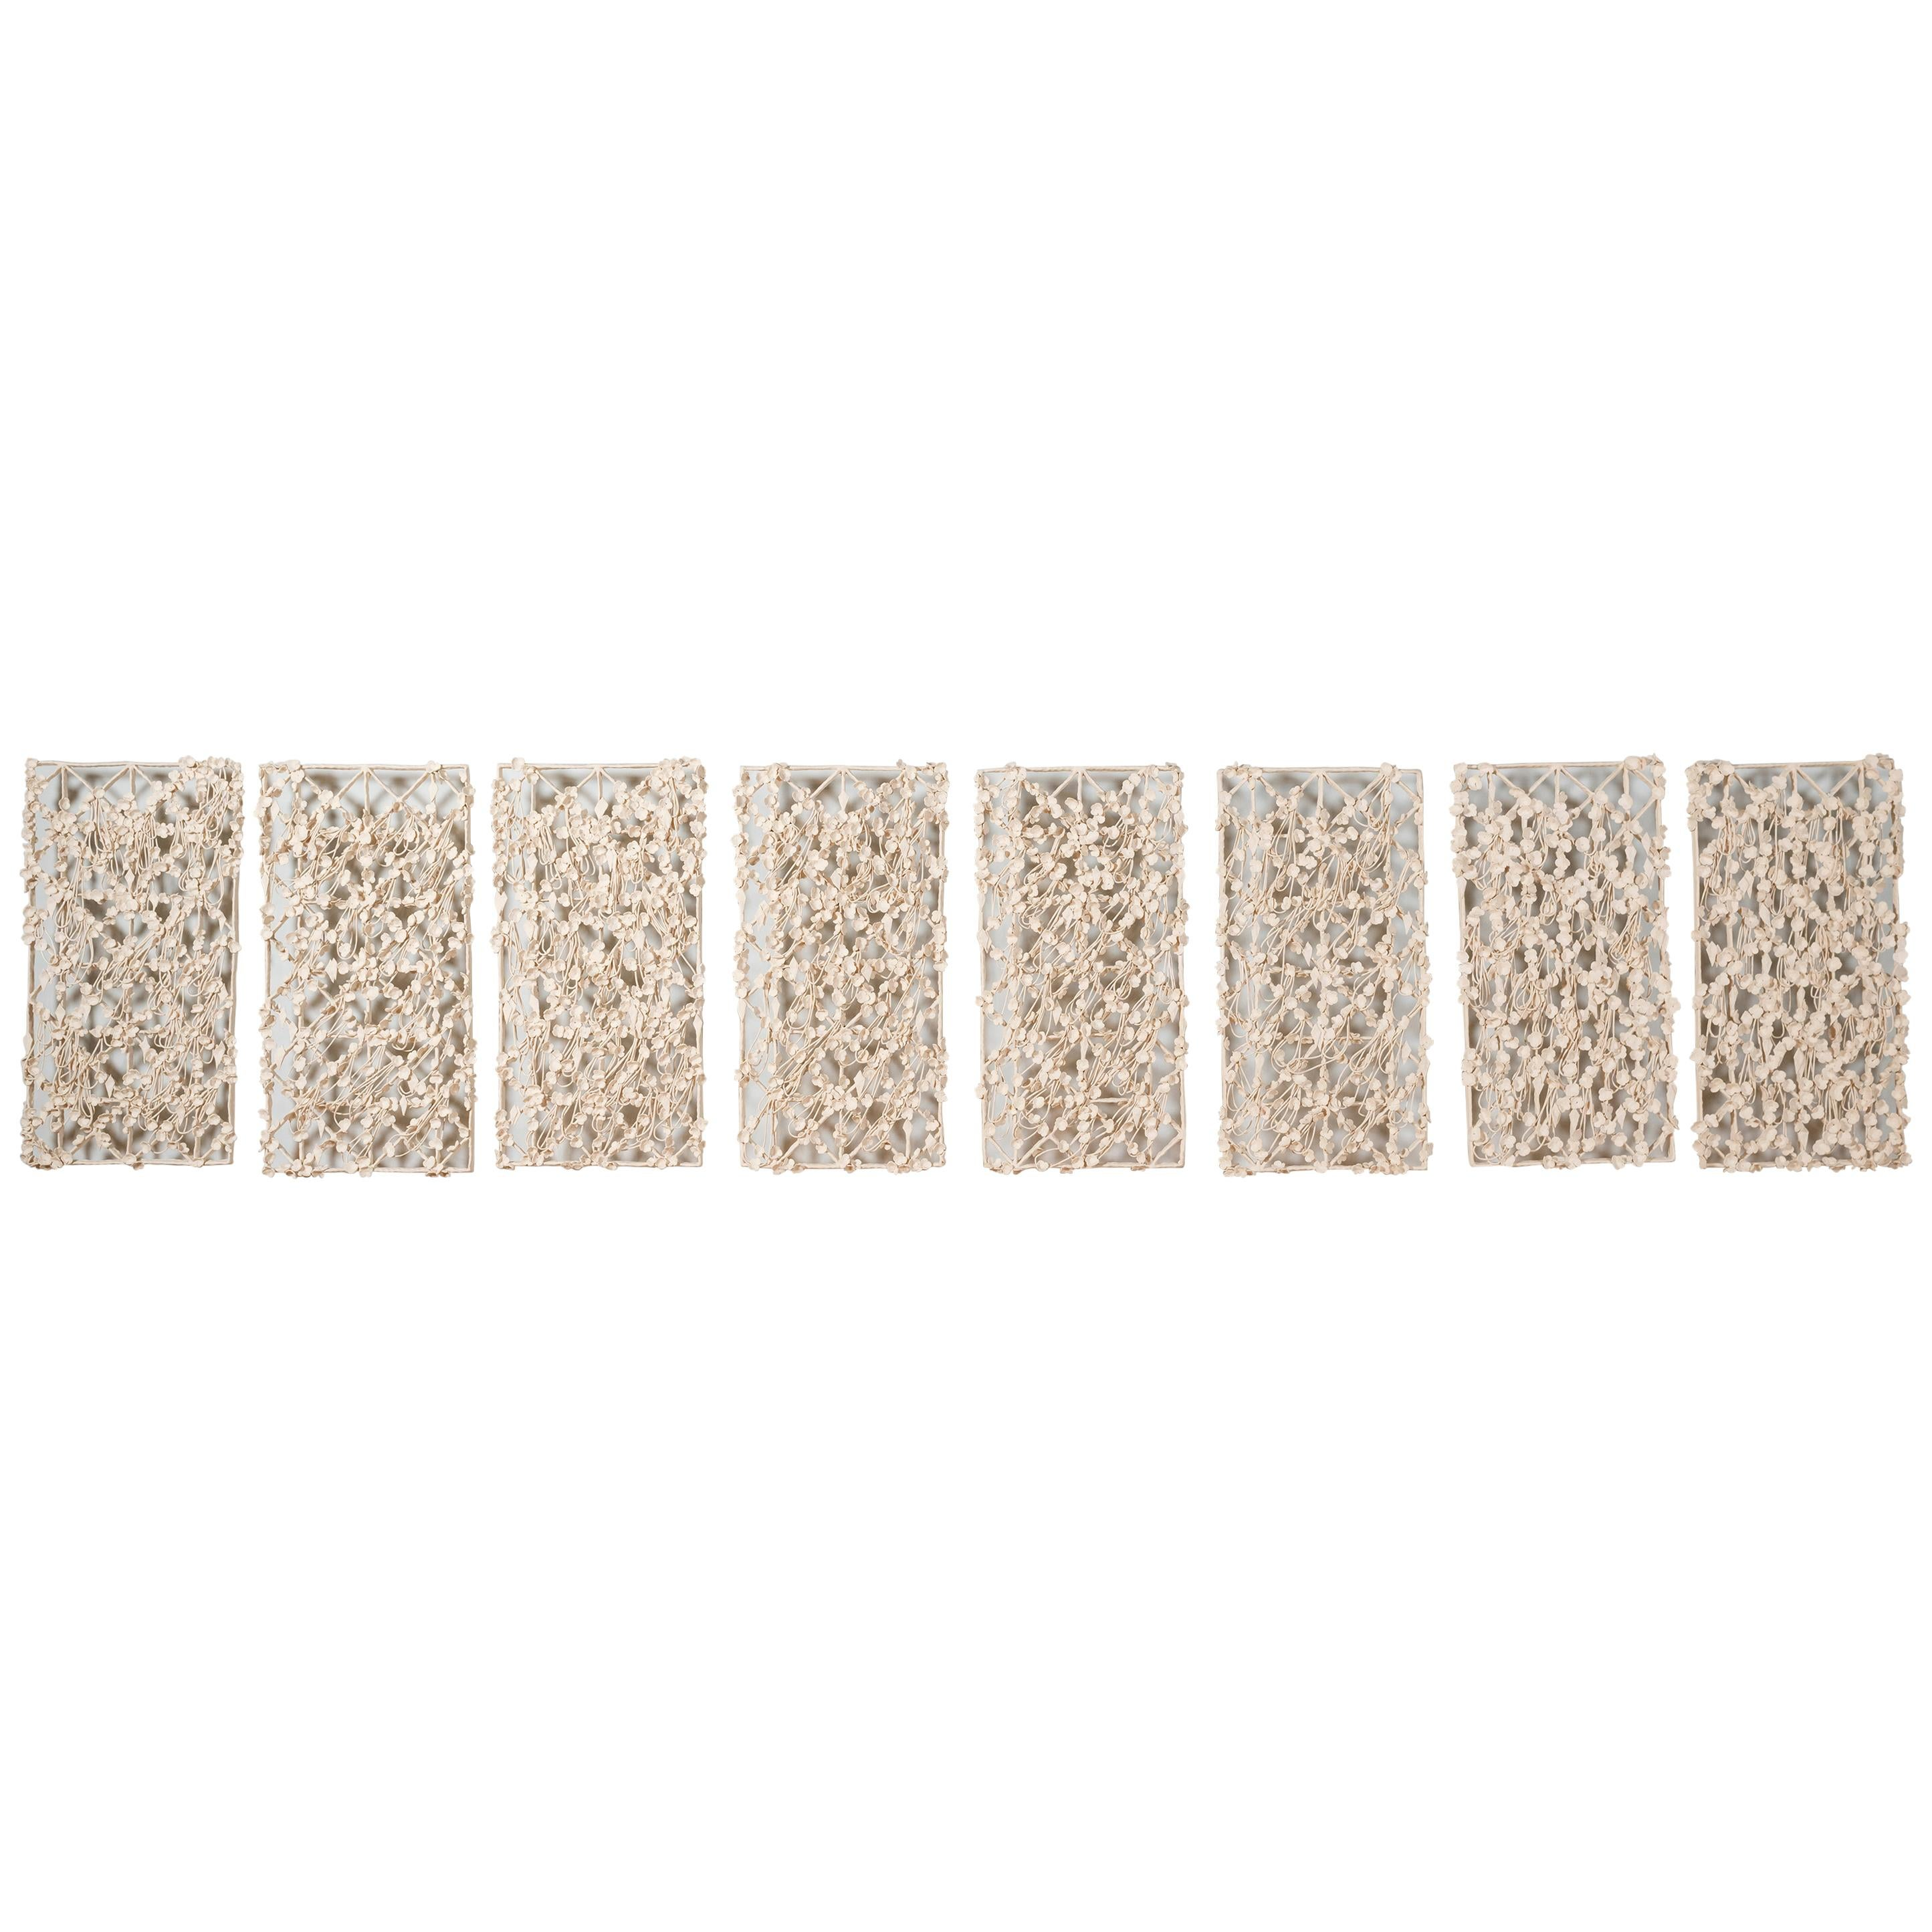 Joanna Poag Binding Time (Lattice Structure w/ Quatrefoil) Wall Panel Sculptures